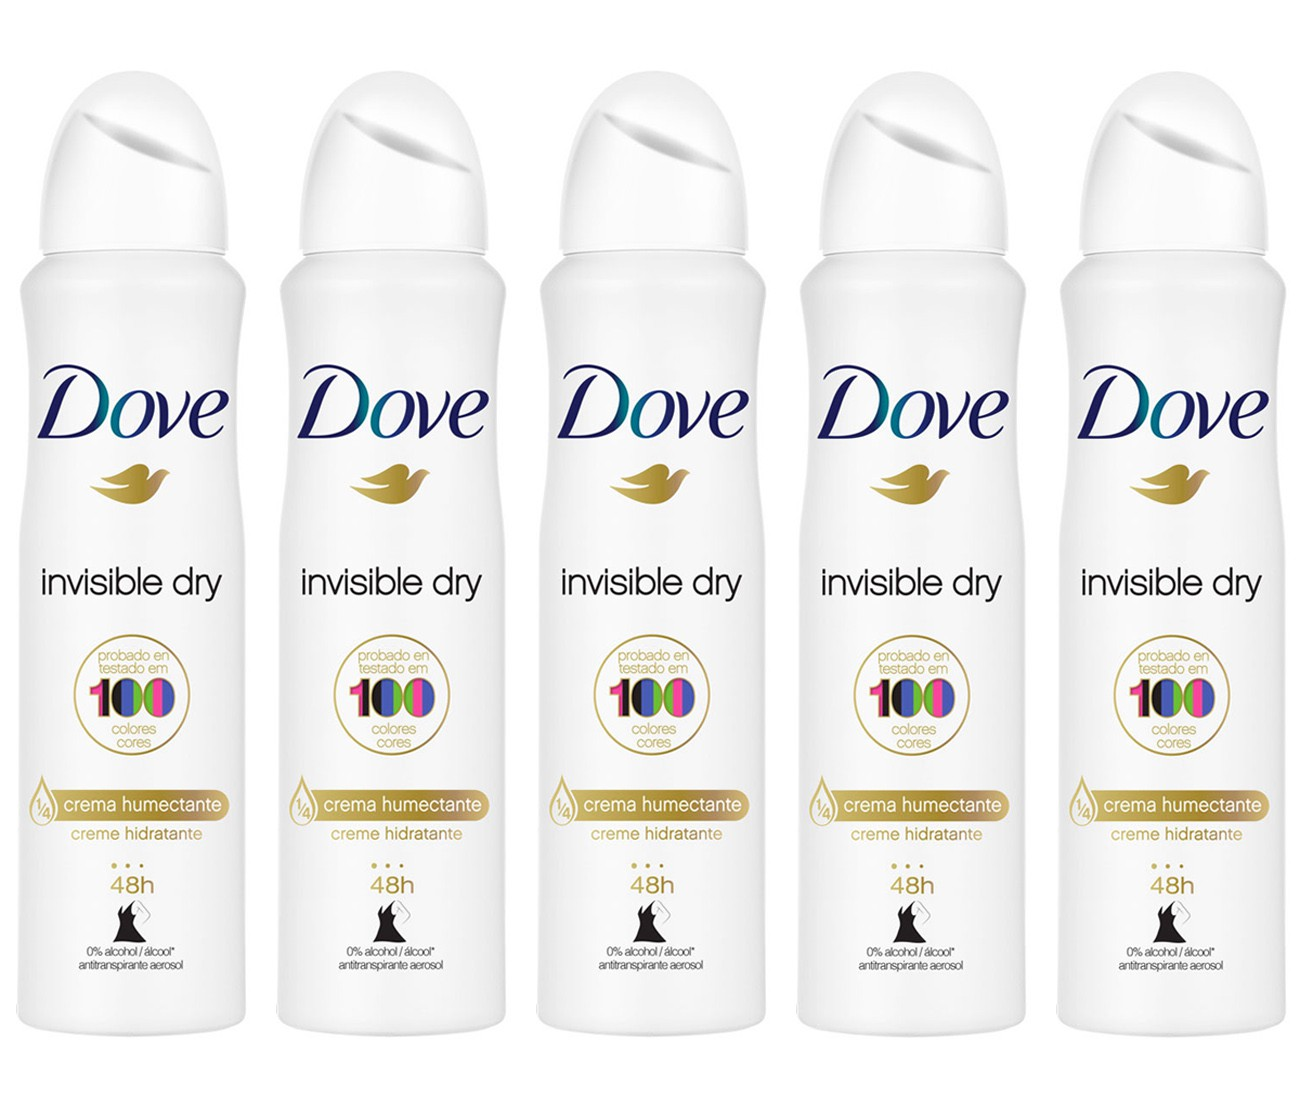 Kit 5 Desodorante Antitranspirante Aerosol Dove Invisible Dry 150ml